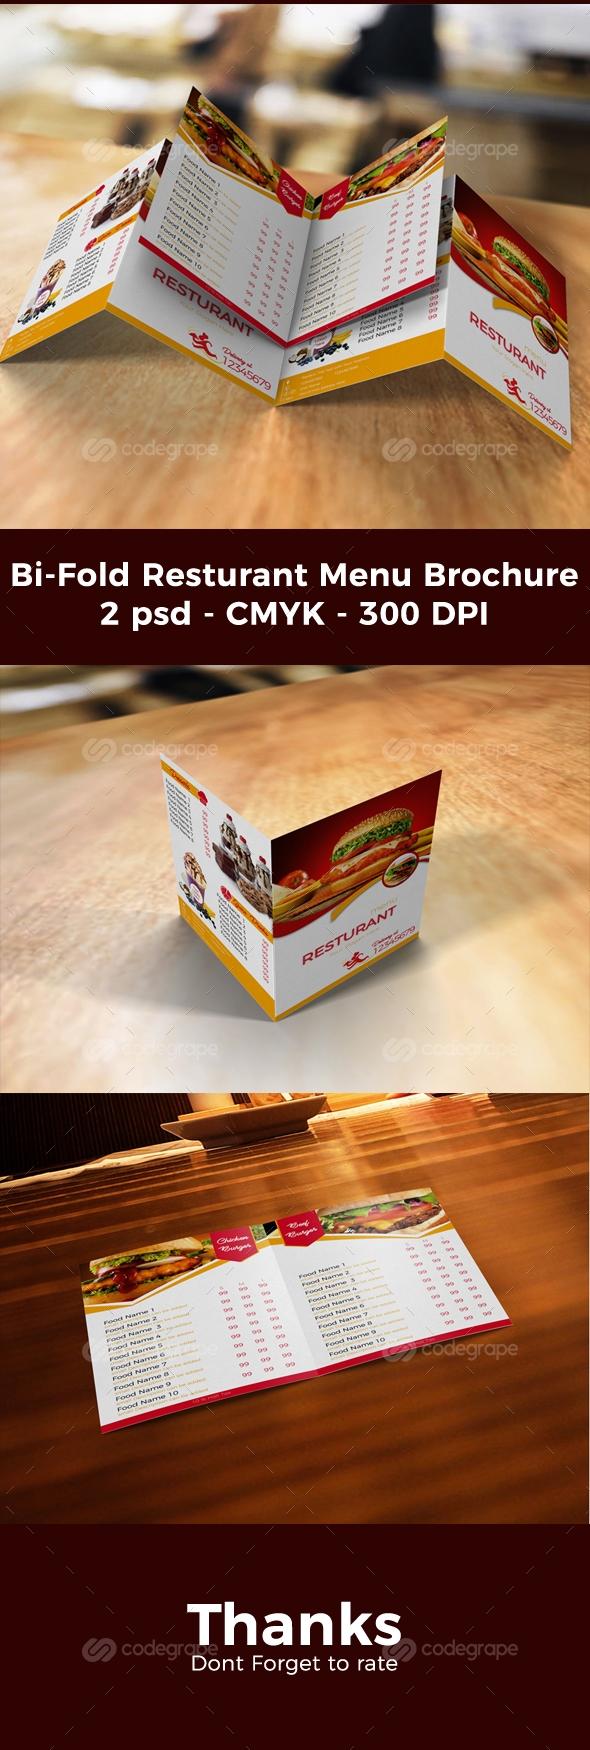 Bi-Fold Resturant Menu Brochure